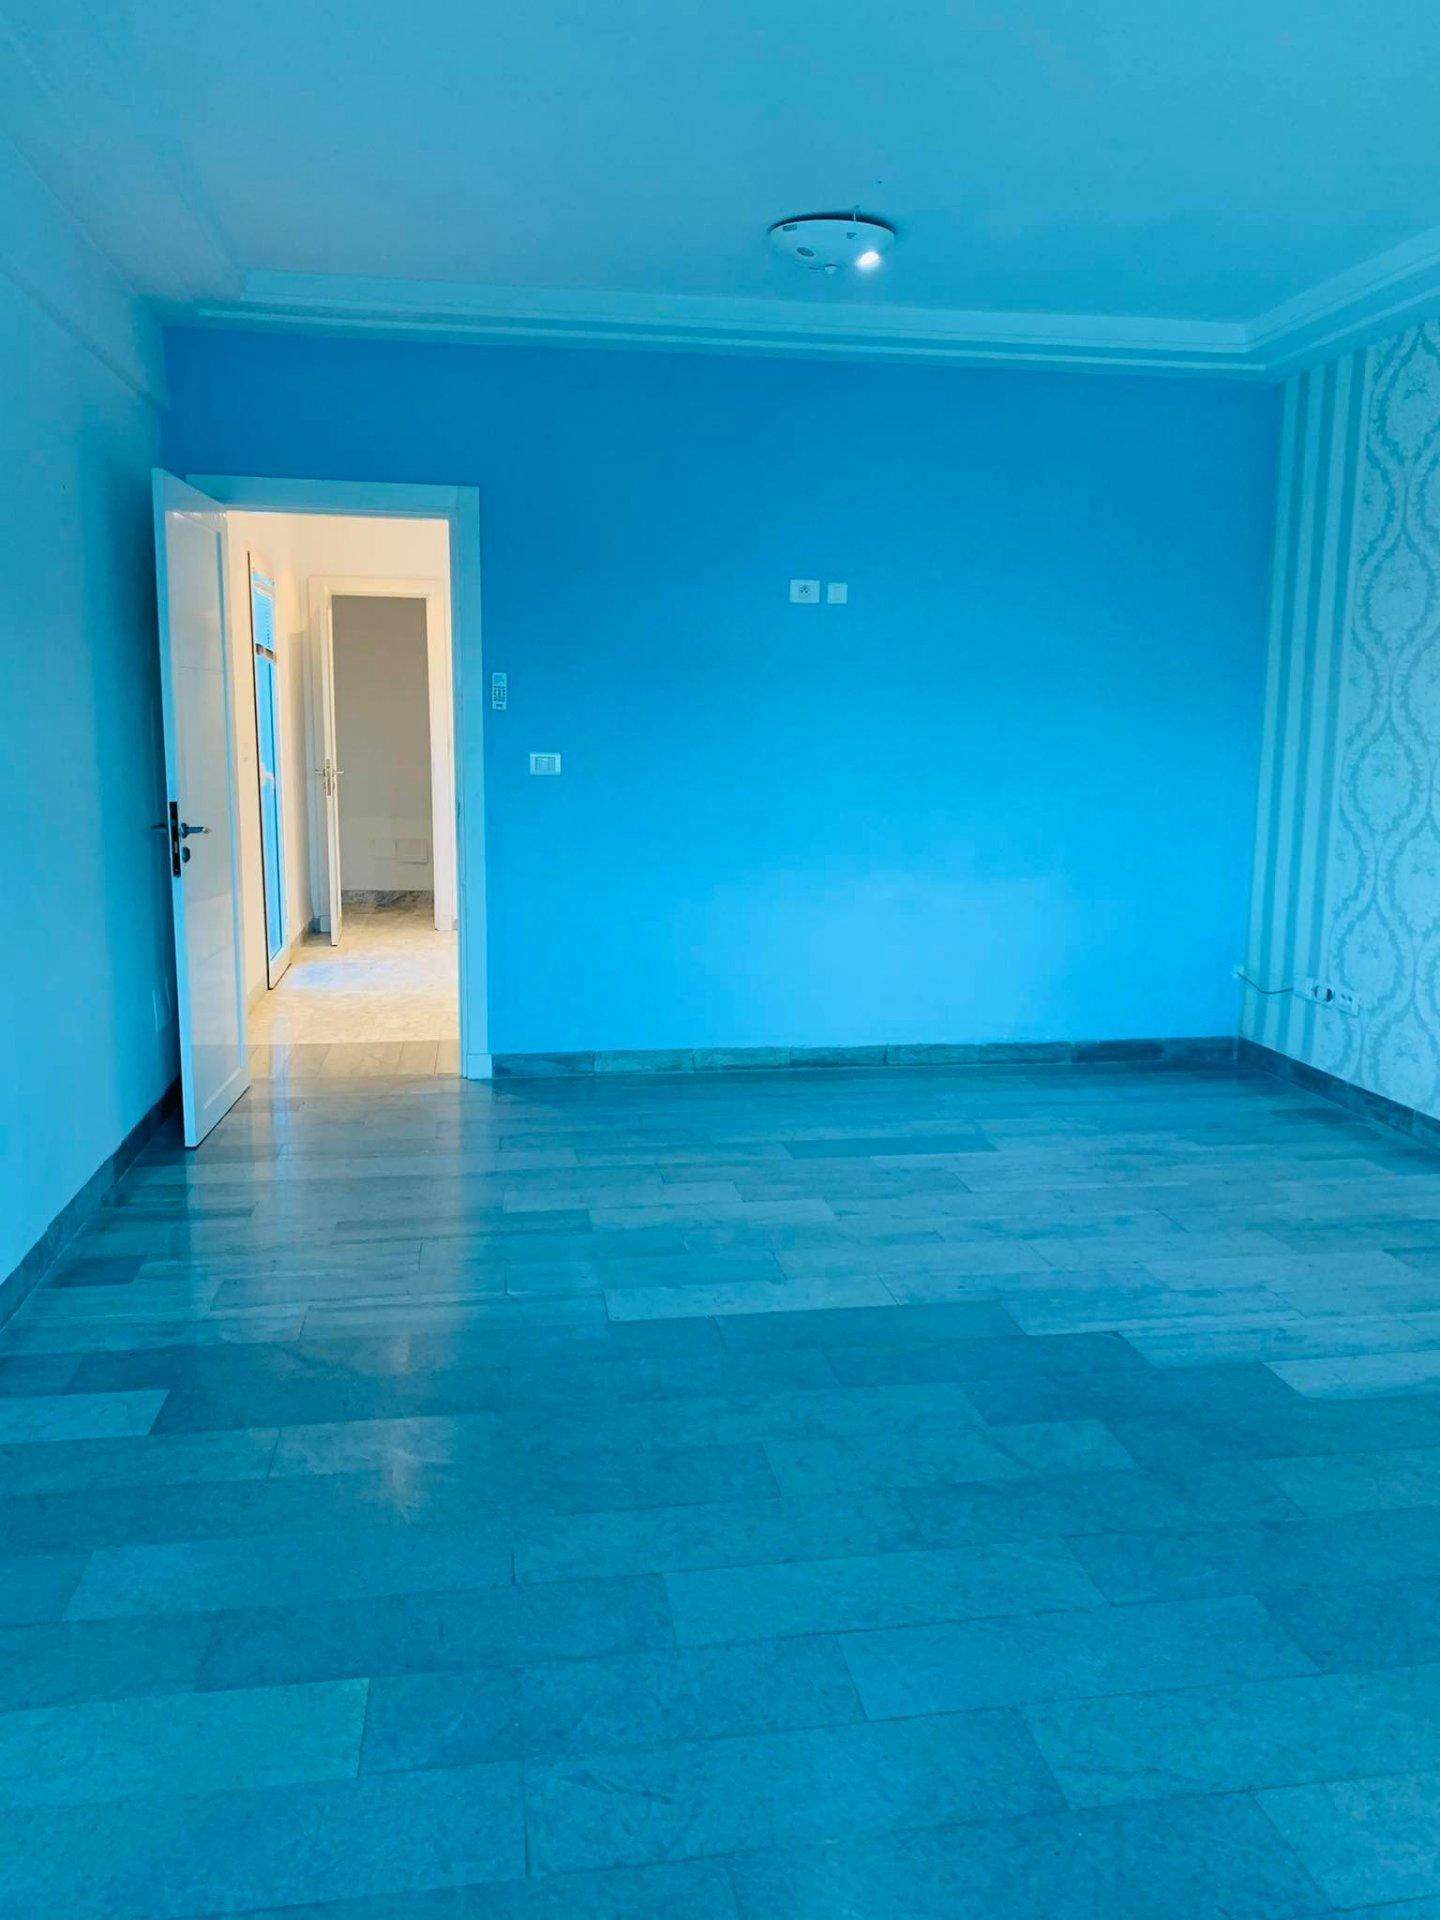 Location Bureau - Ariana Cité Ennasr 2 - Tunisie